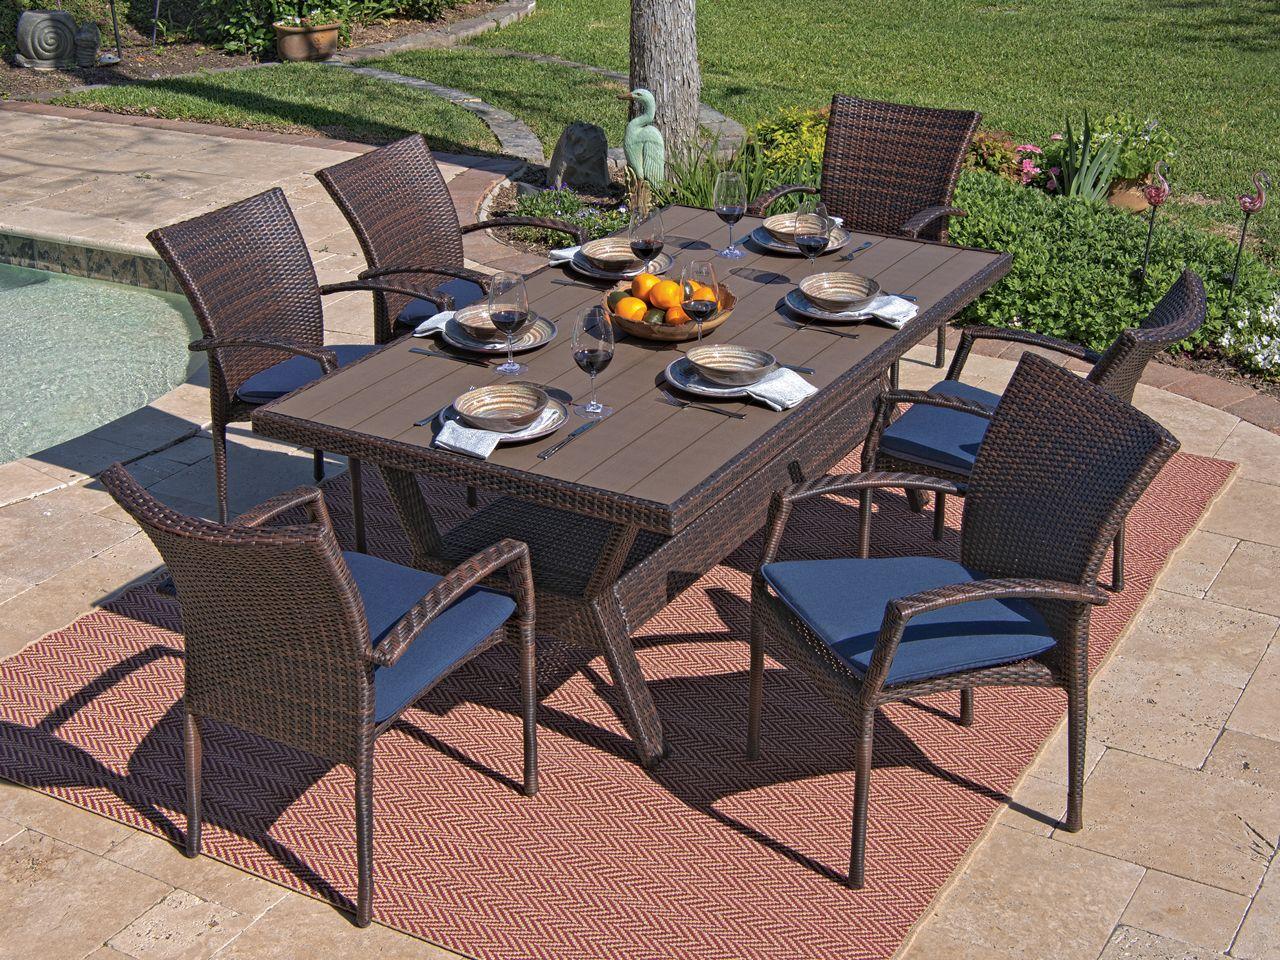 Sierra 7 Pc Aluminum Resin Wicker Dining Set Fortunoff Backyard Store Outdoor Patio Set Outdoor Wicker